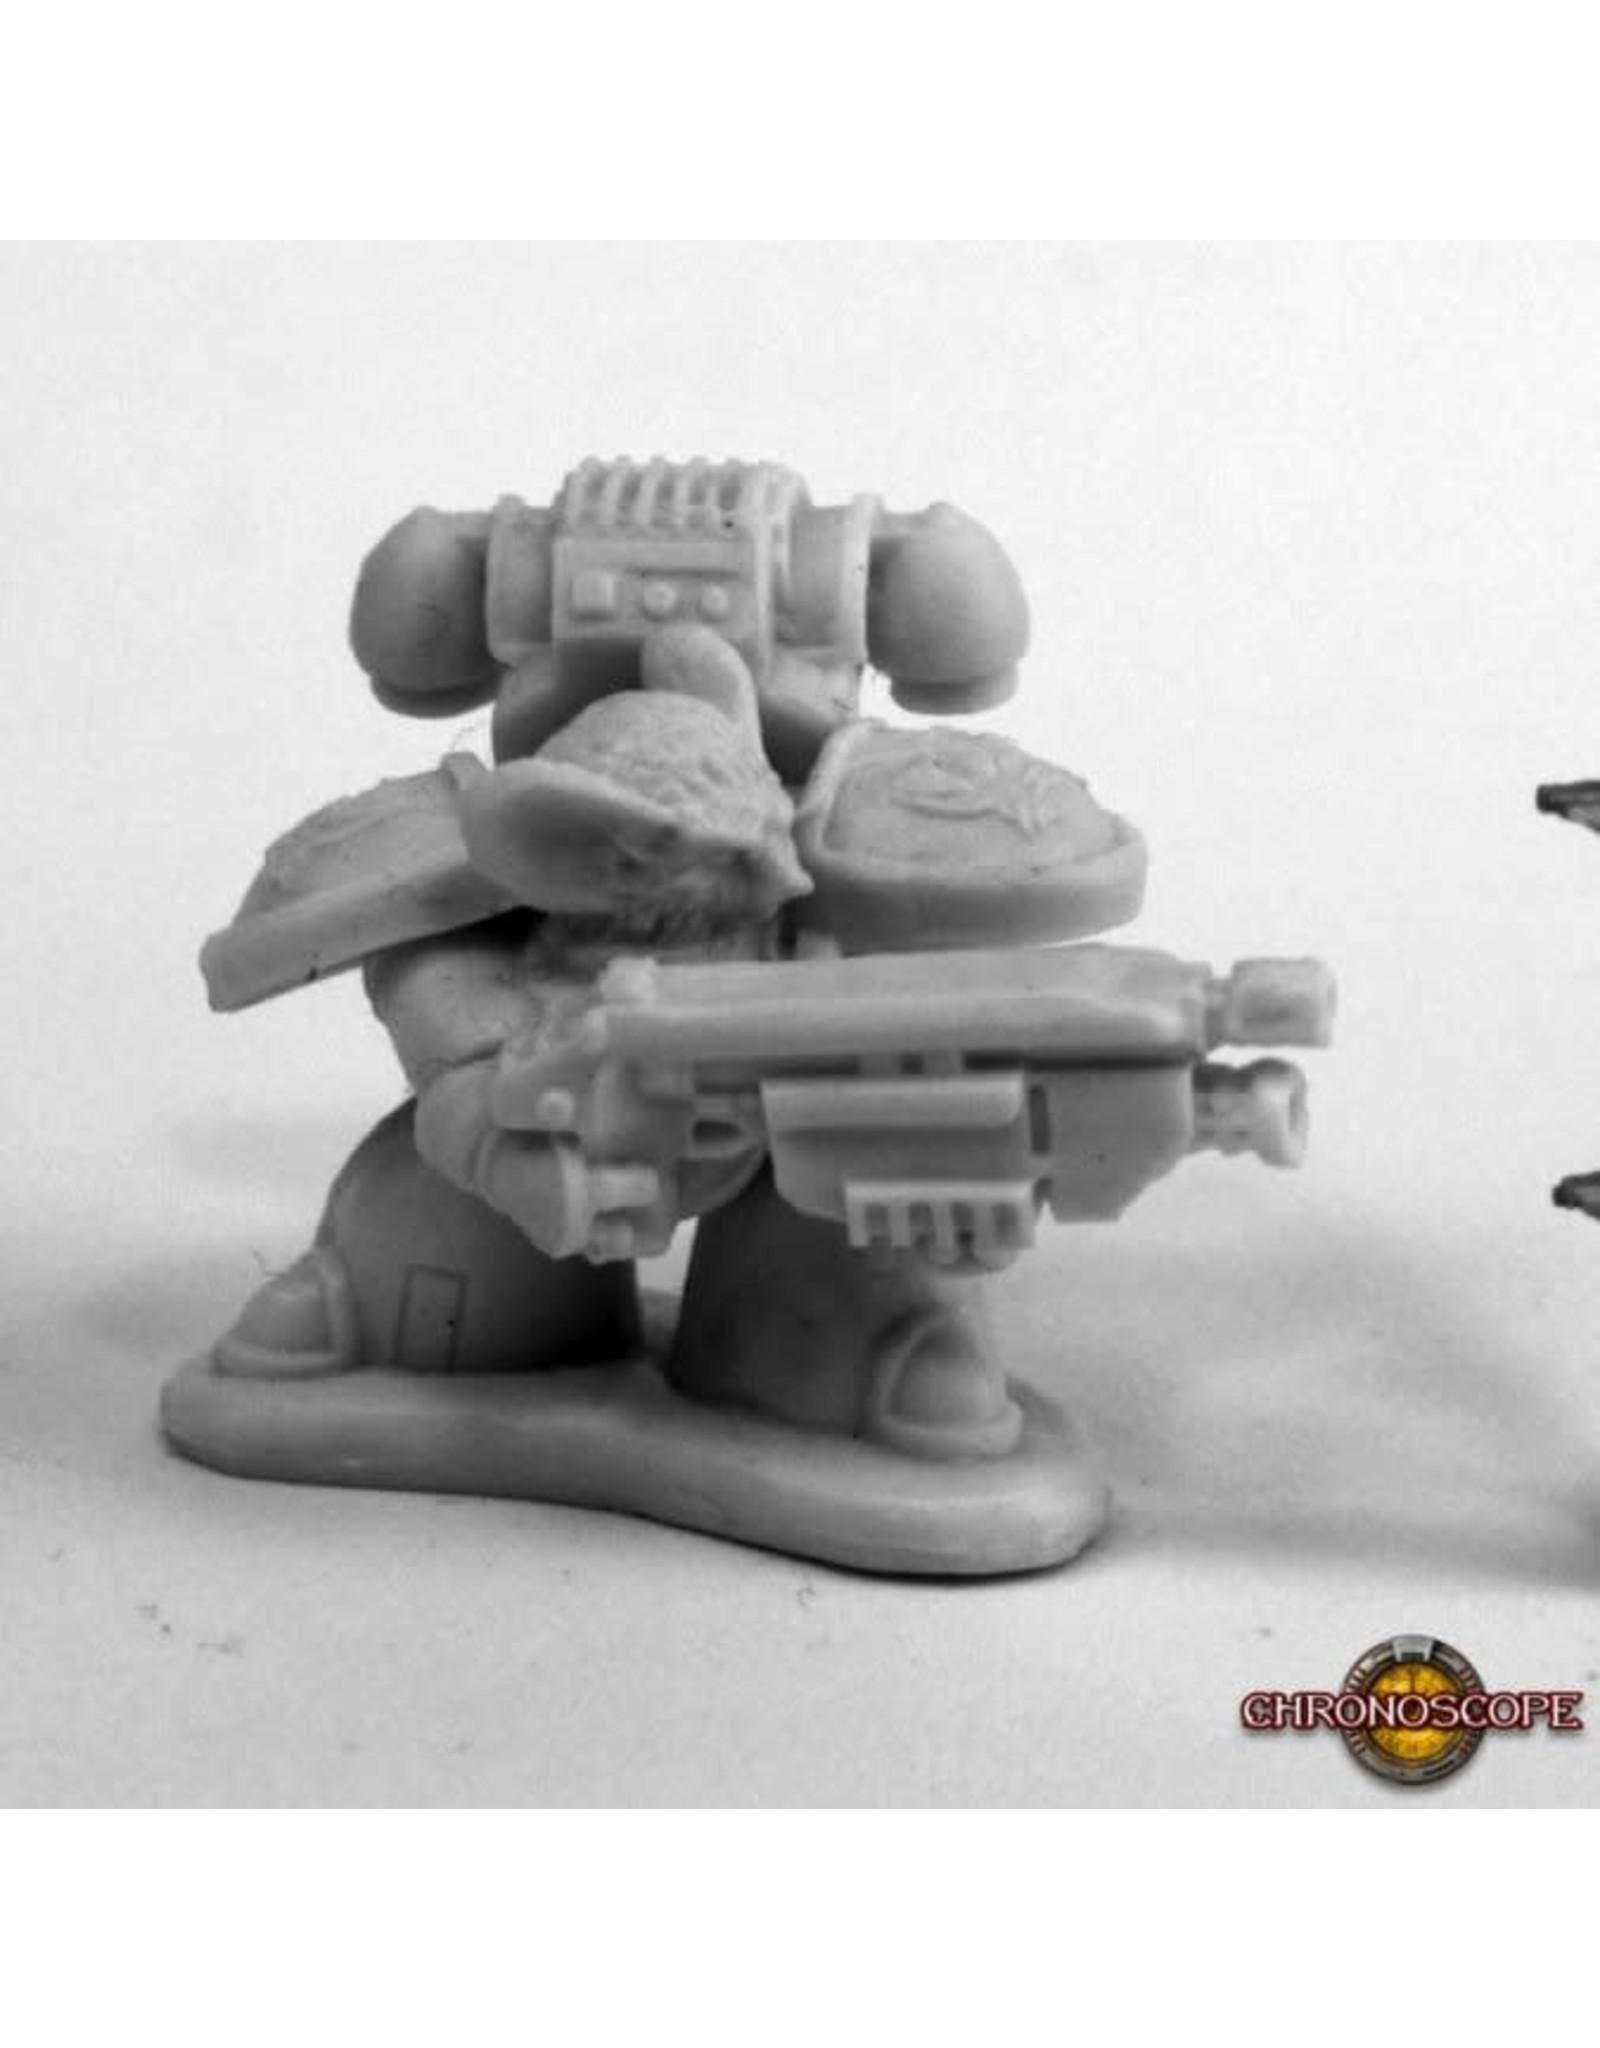 Reaper Miniatures Bones Space Mousling Looking Left